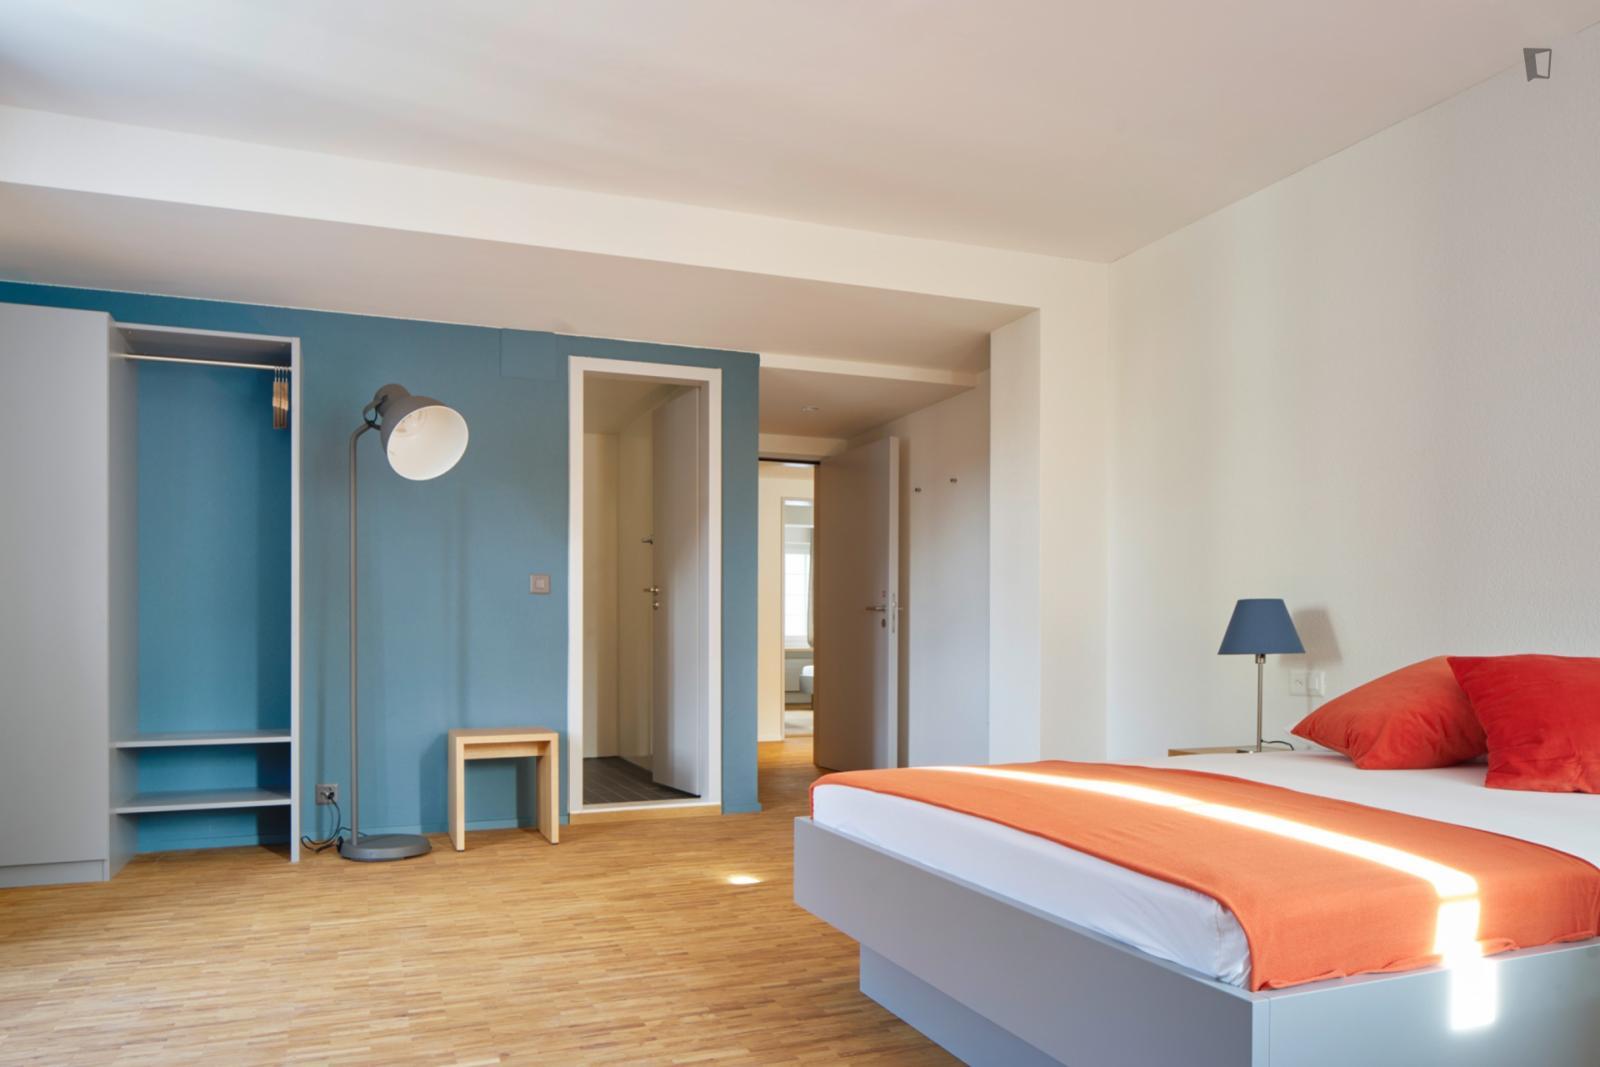 Lutherstrasse - 2775CHF / month